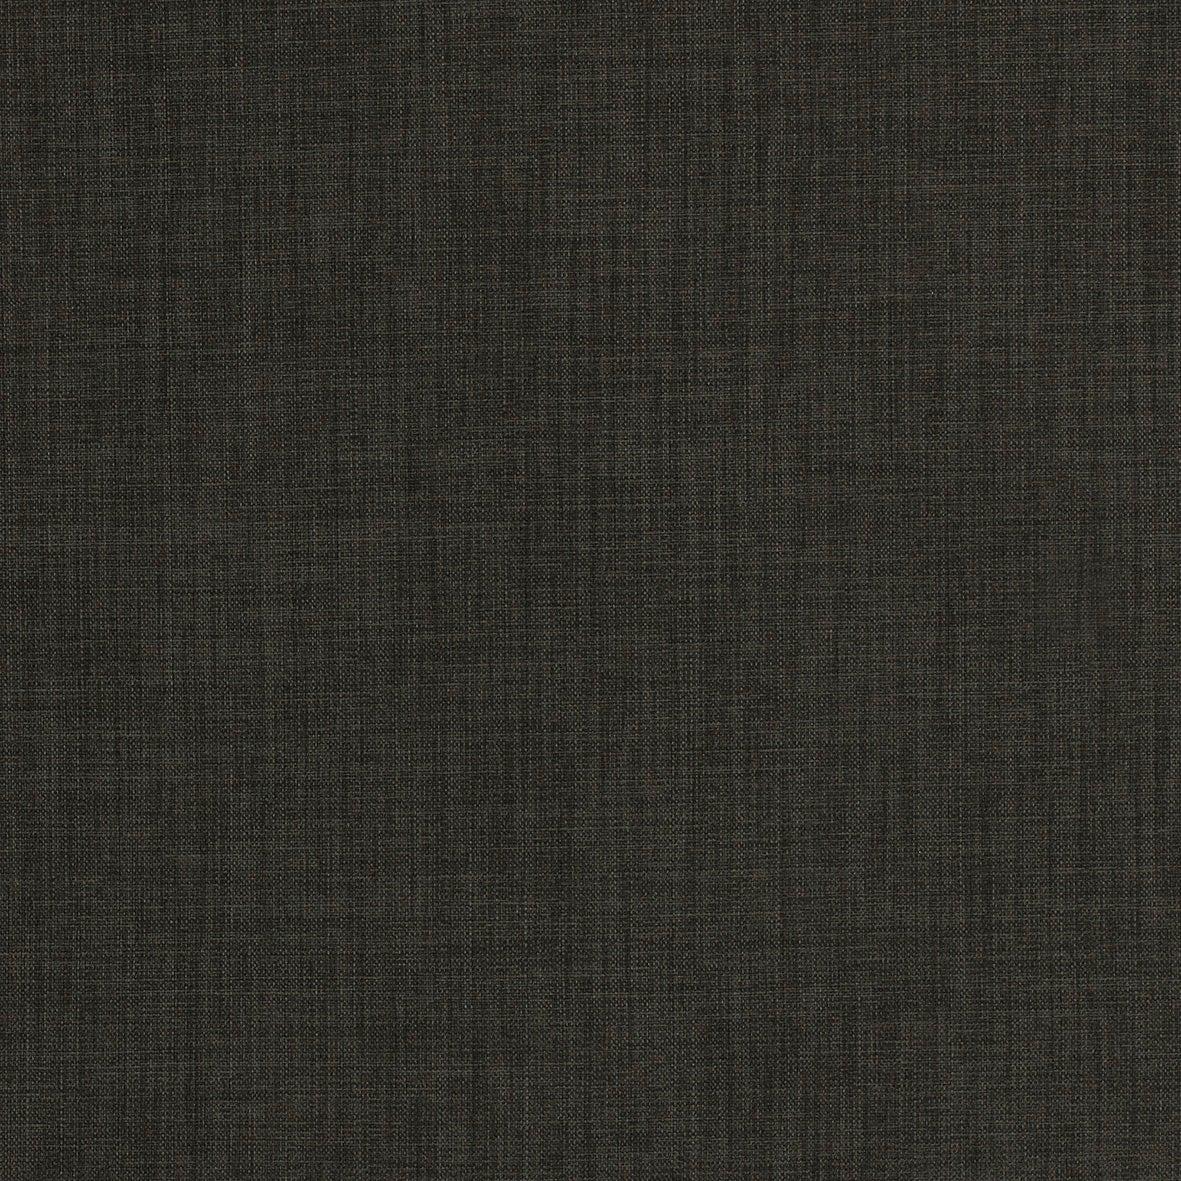 Dark Linso Fabric Sample